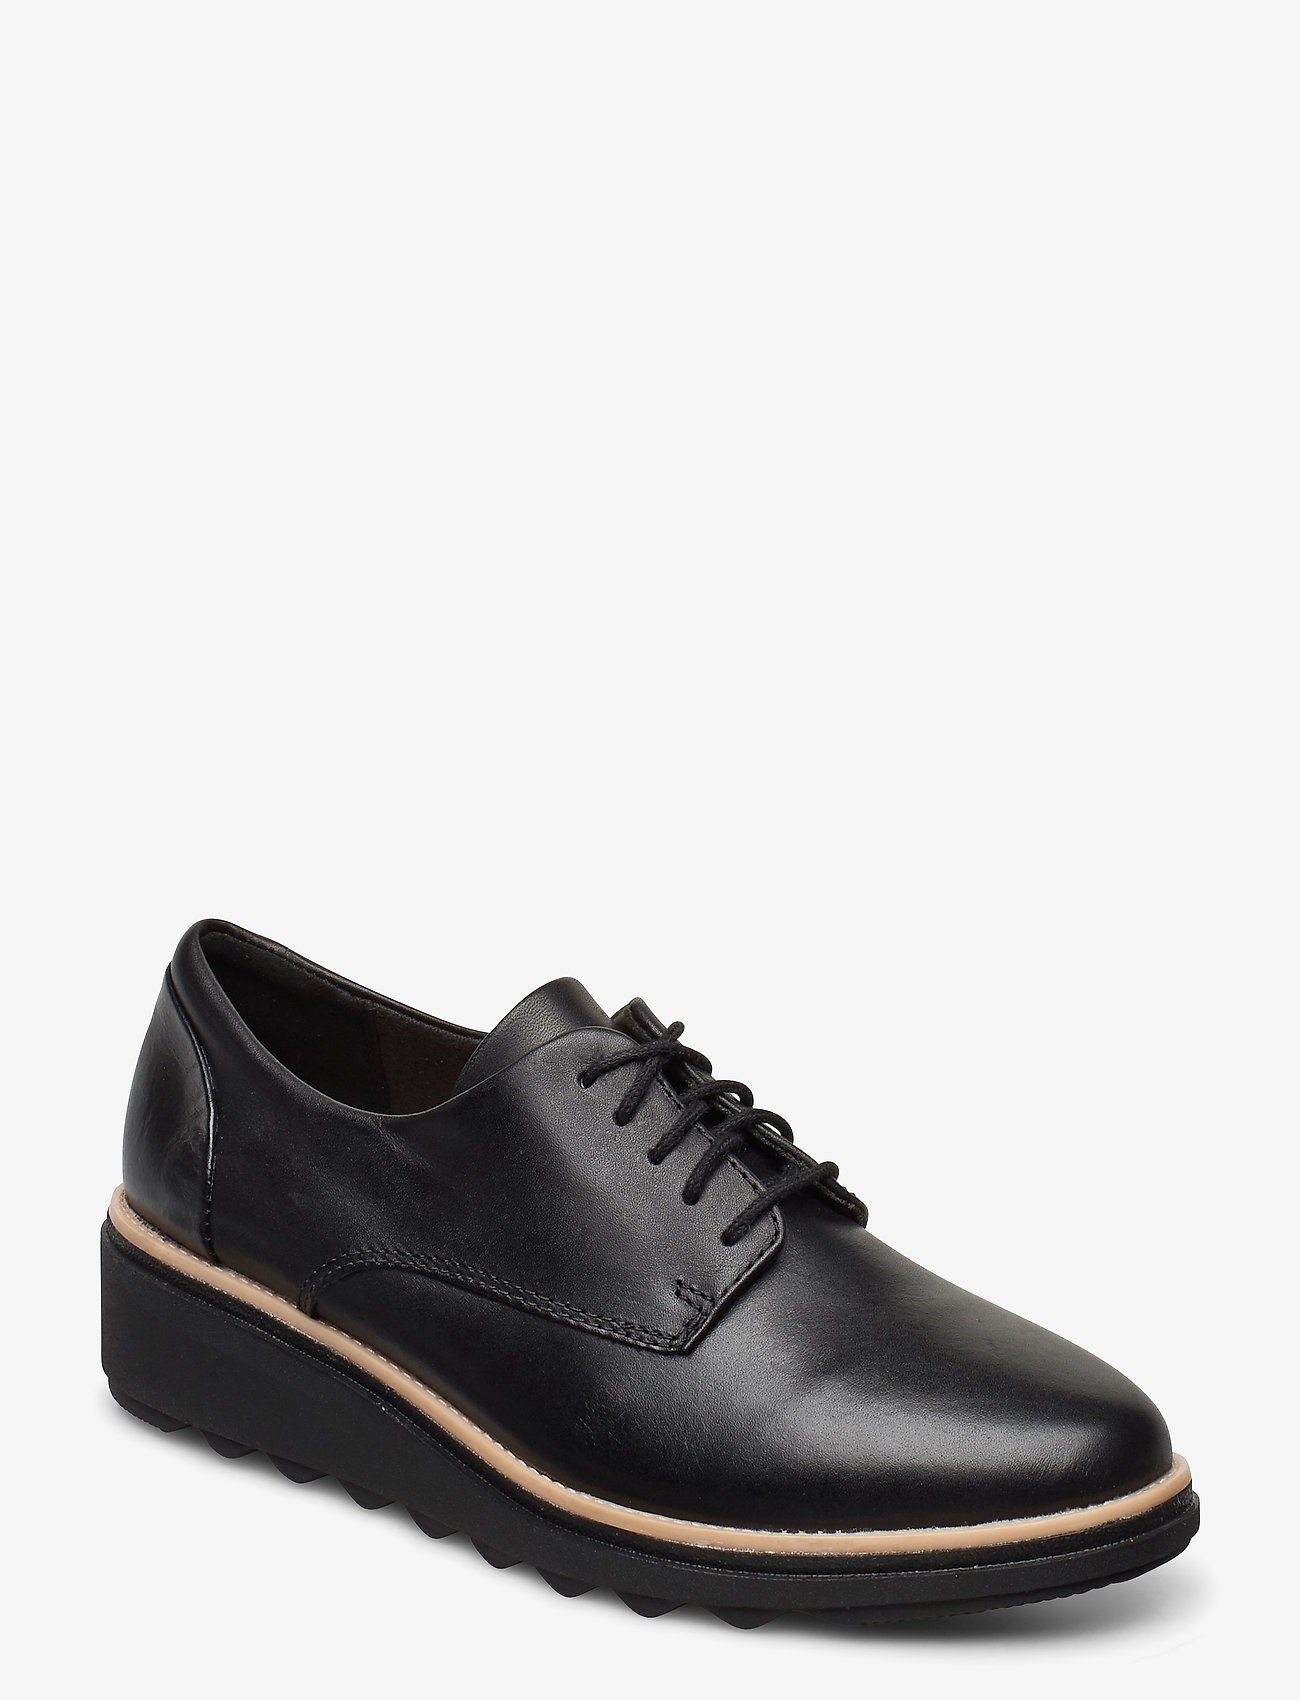 Clarks - Sharon Noel - buty sznurowane - black leather - 0